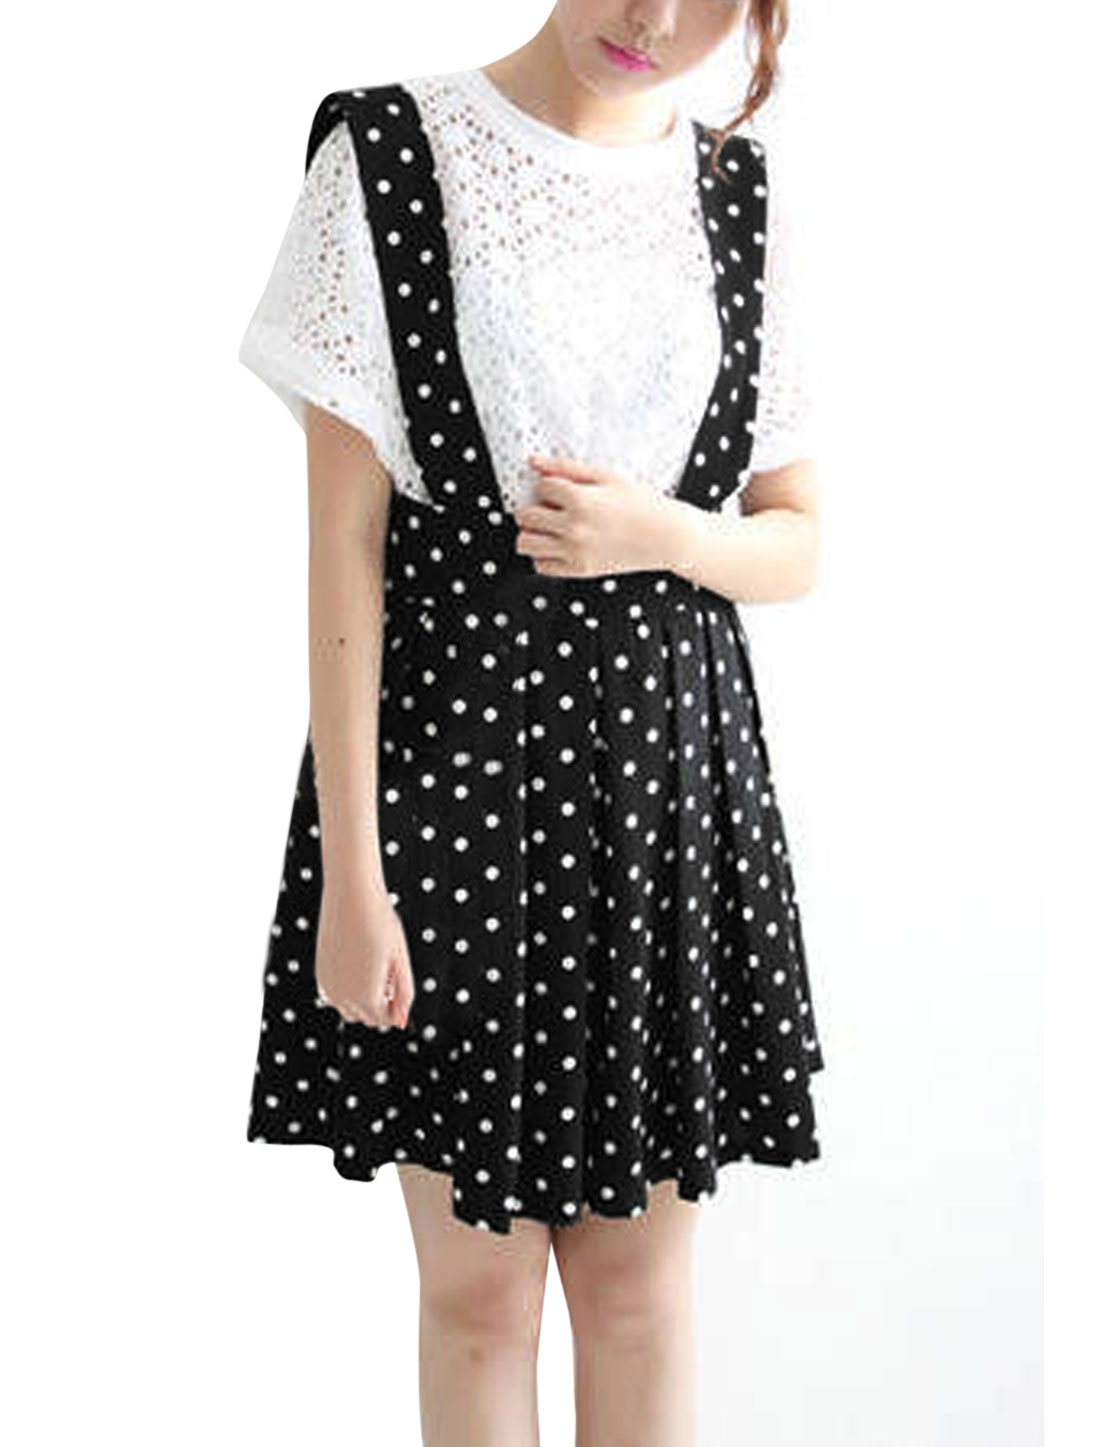 Women Dots Prints Elastic Waist Lining Suspender Skirt Black S